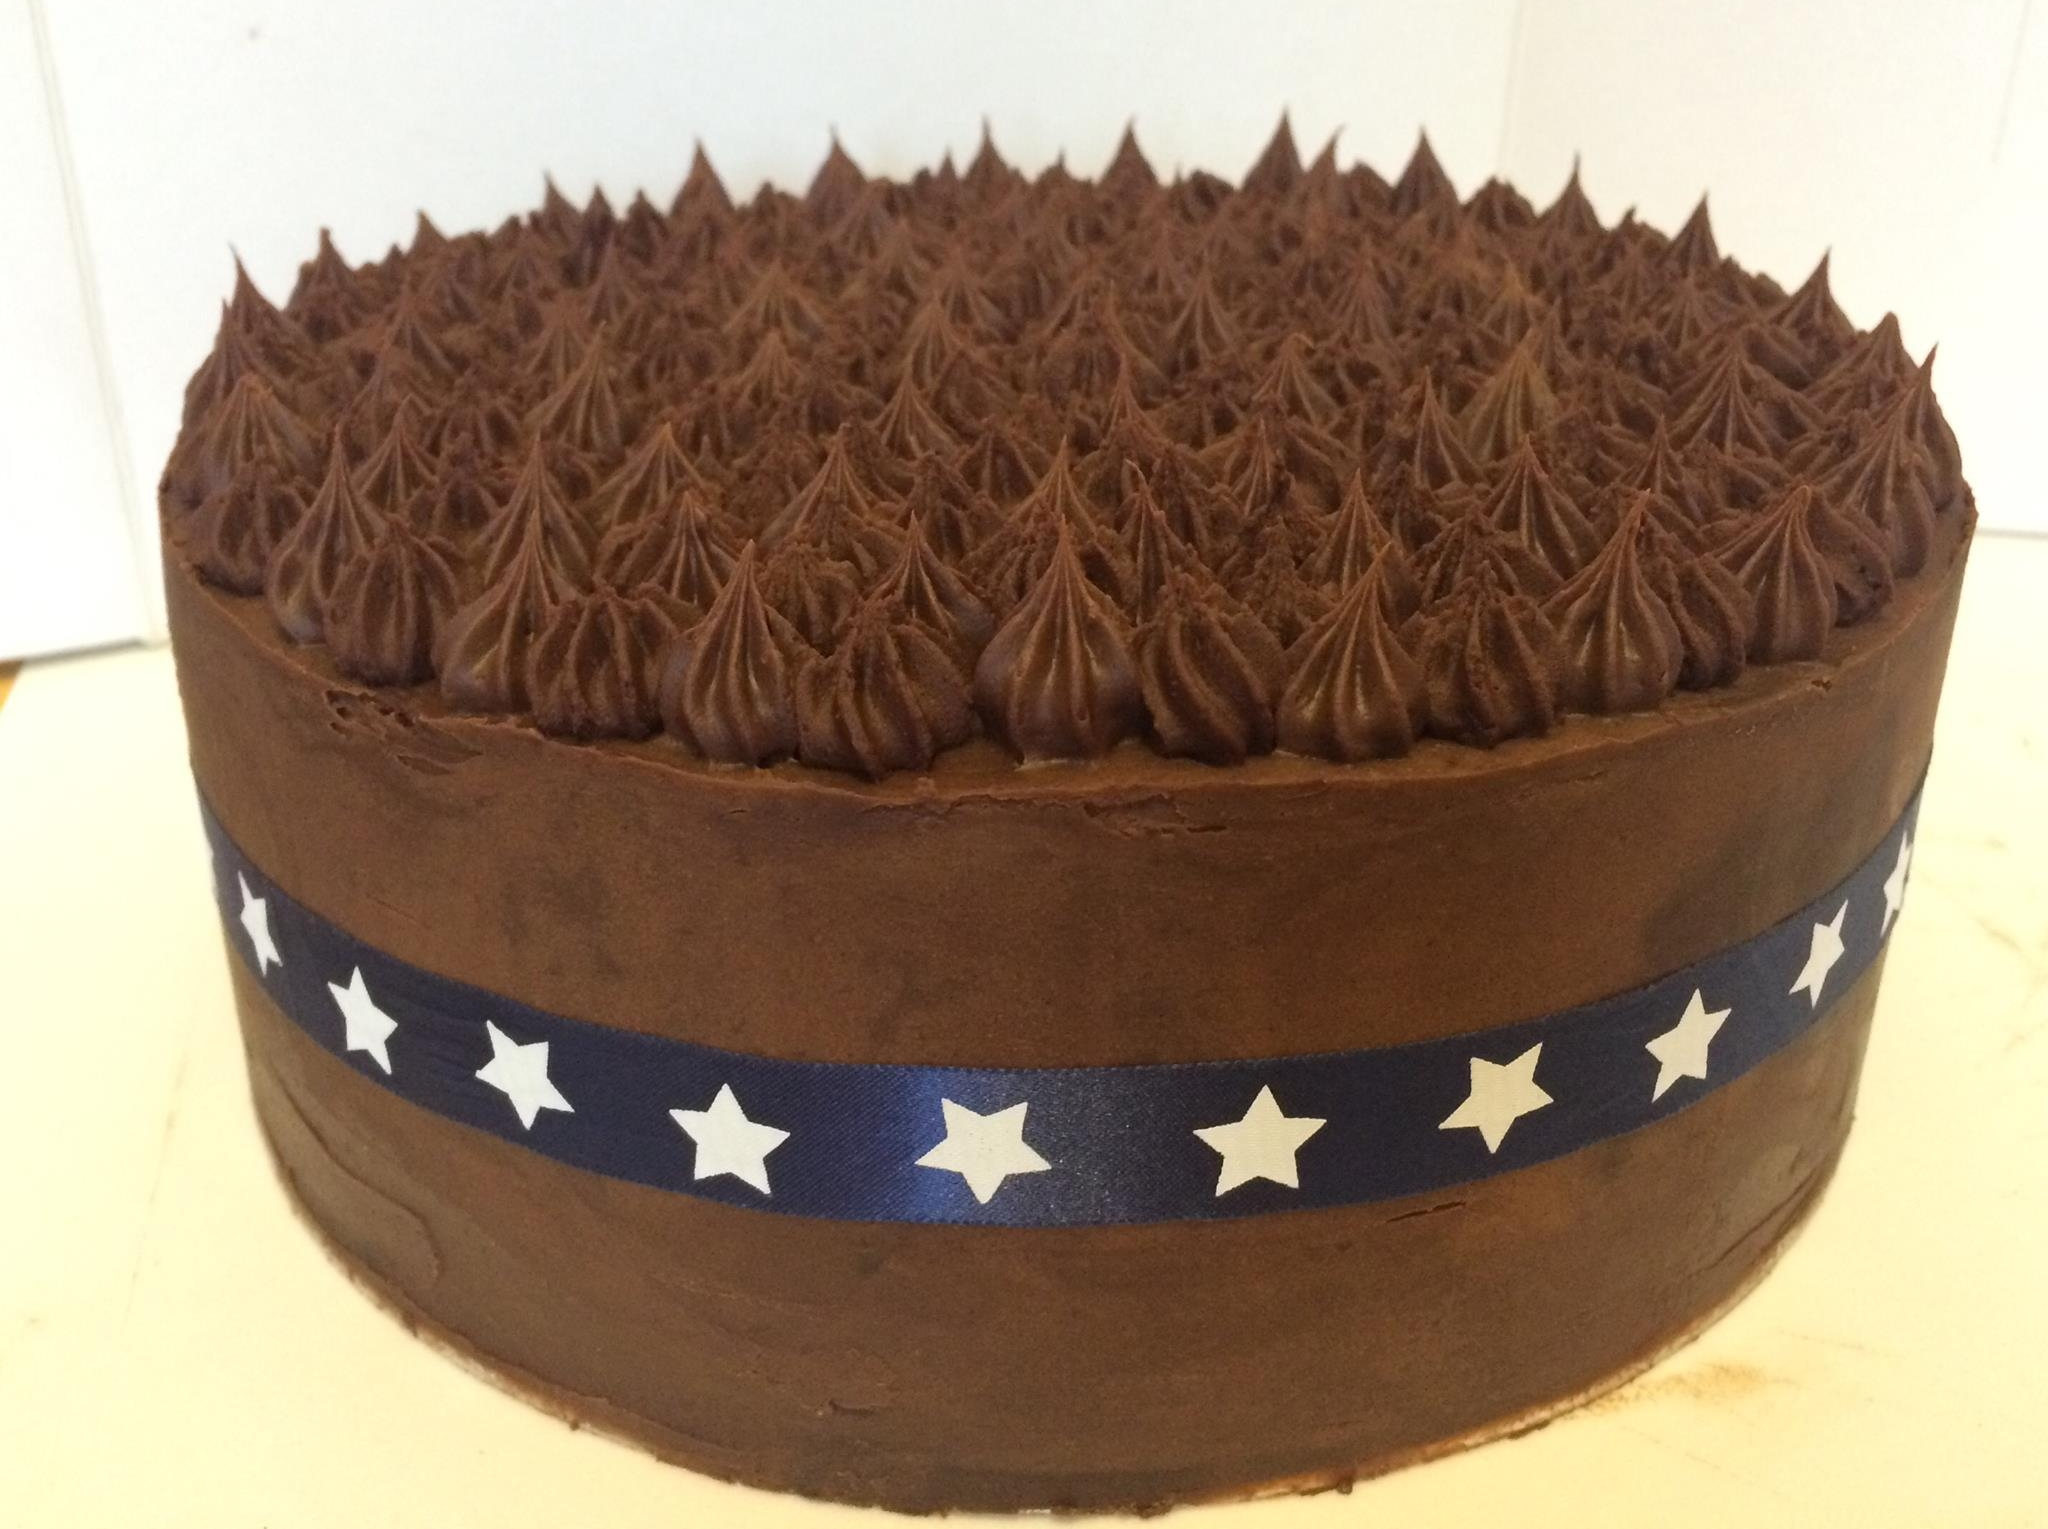 Decedant homemade chocoate cake